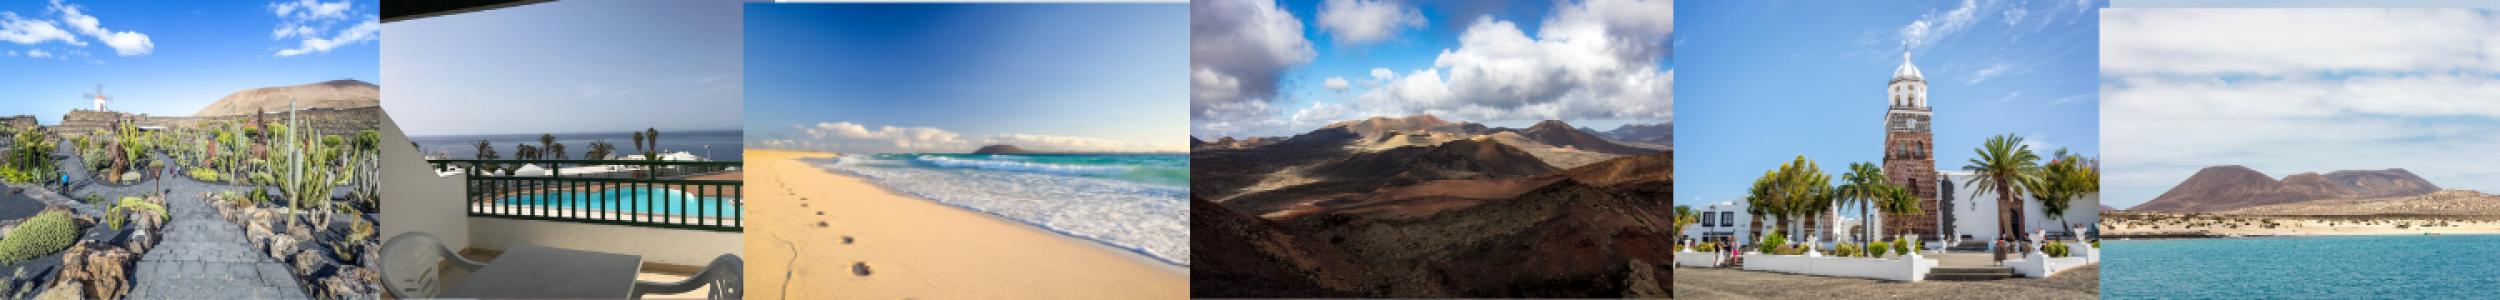 Canaries, Lanzarote : séjour 8j/7n en appart'hôtel vue mer + vols A/R